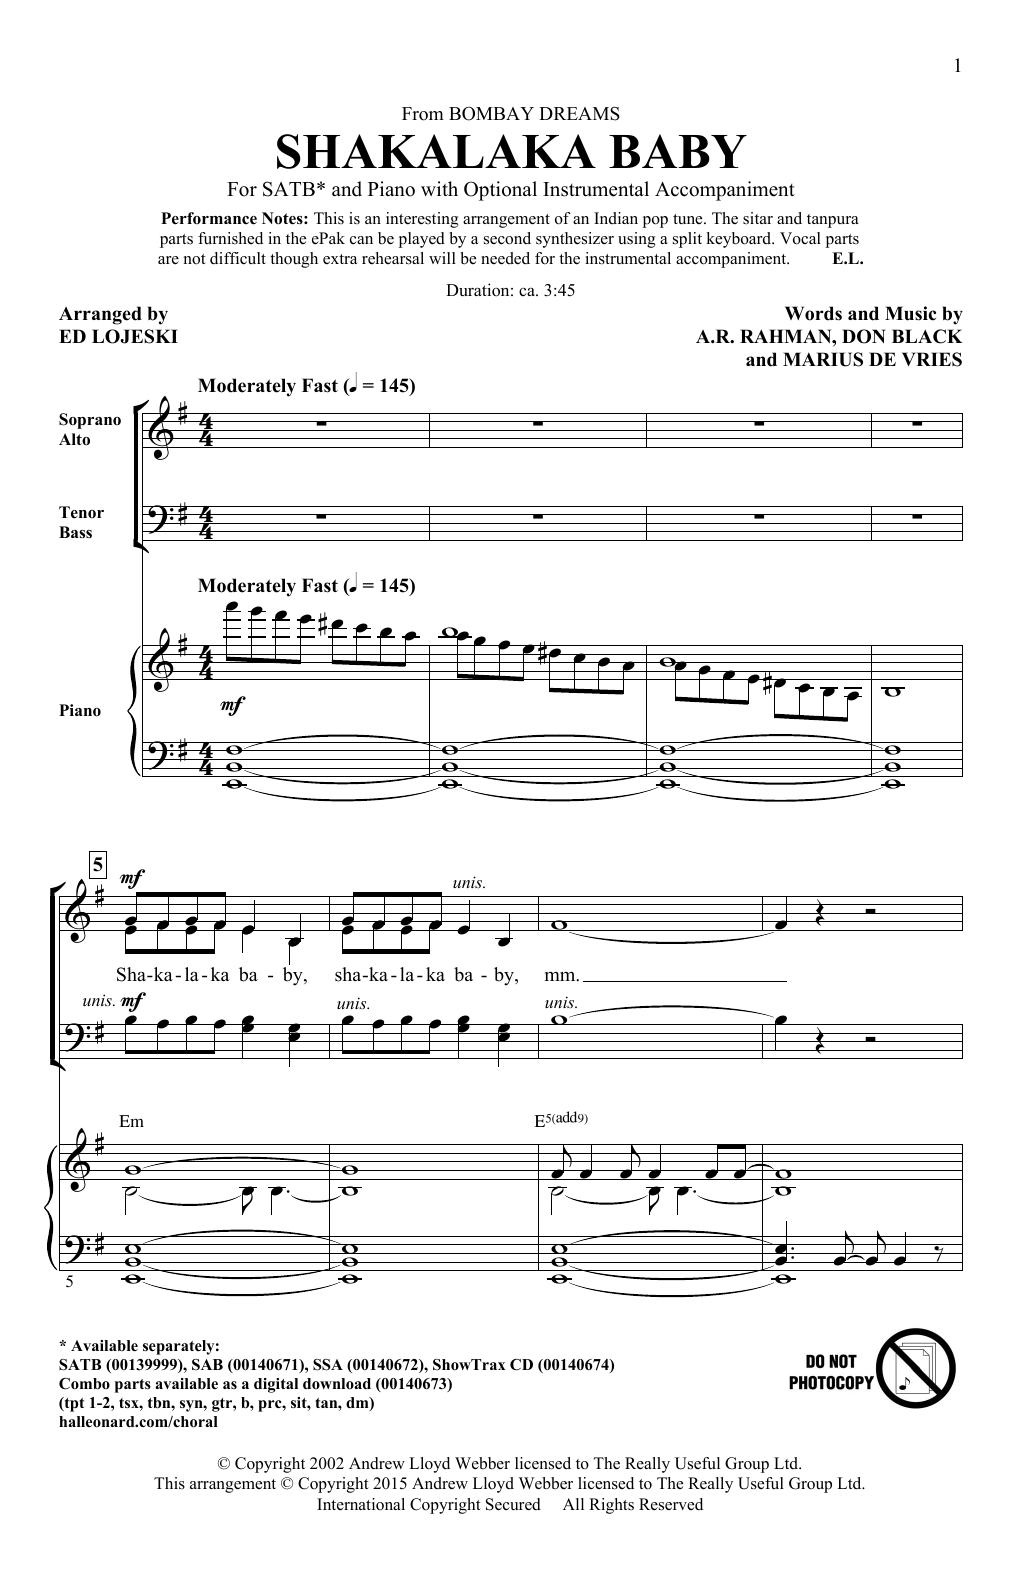 Partition chorale Shakalaka Baby (from Bombay Dreams) (arr. Ed Lojeski) de A. R. Rahman - SATB